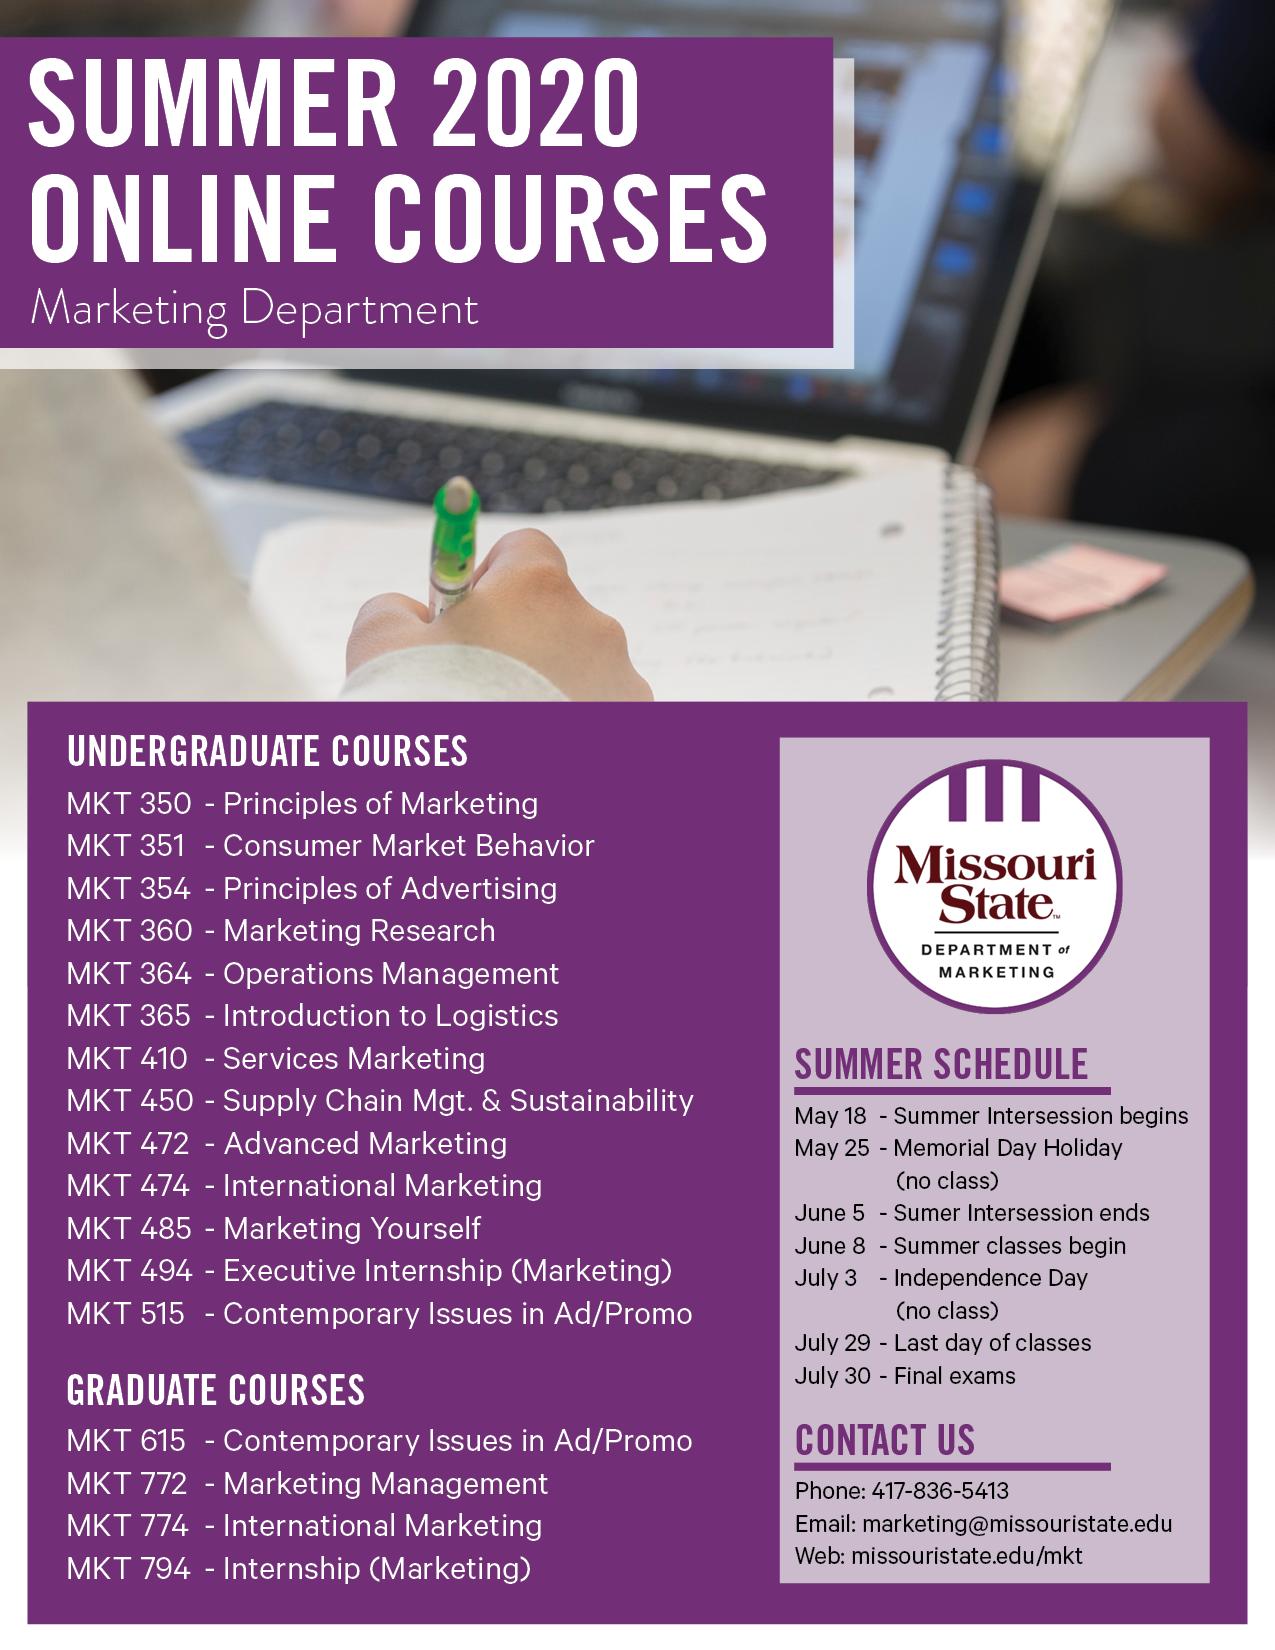 Summer 2020 Online Courses Flyer